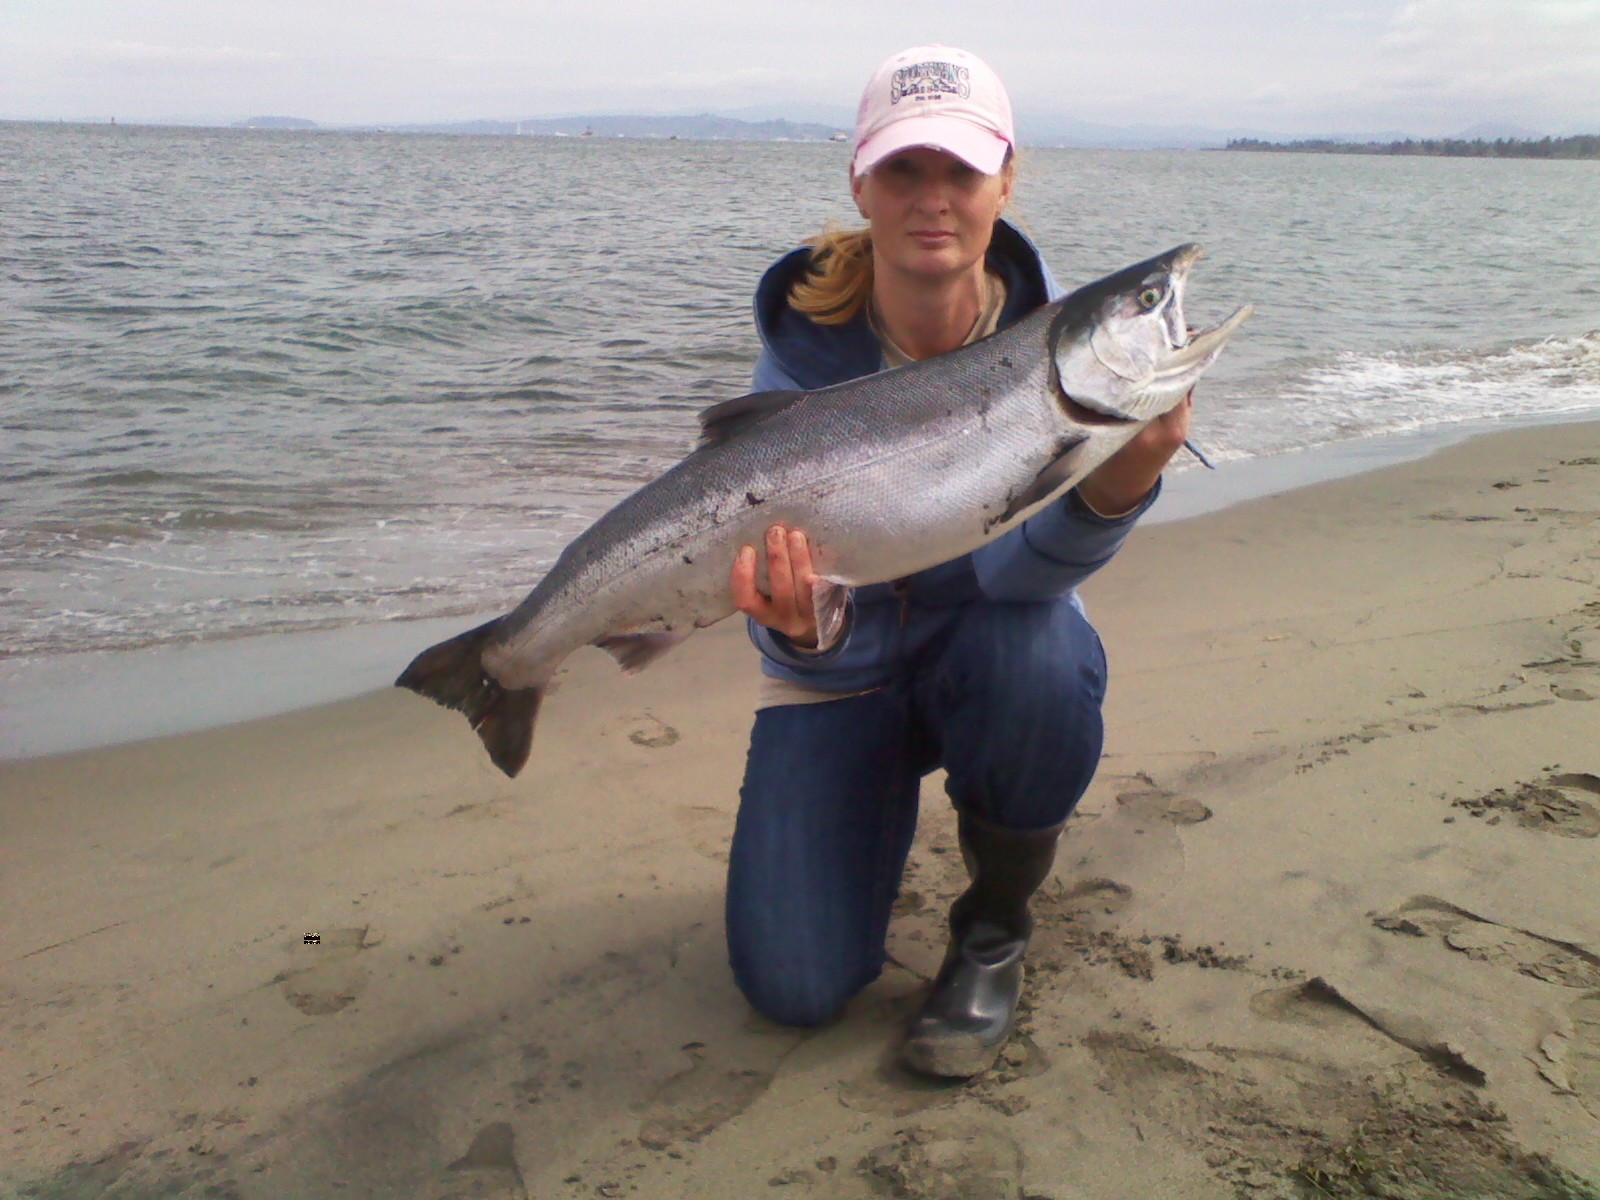 Fishing report archive oregon coast central oregon coast for Oregon coast fishing report